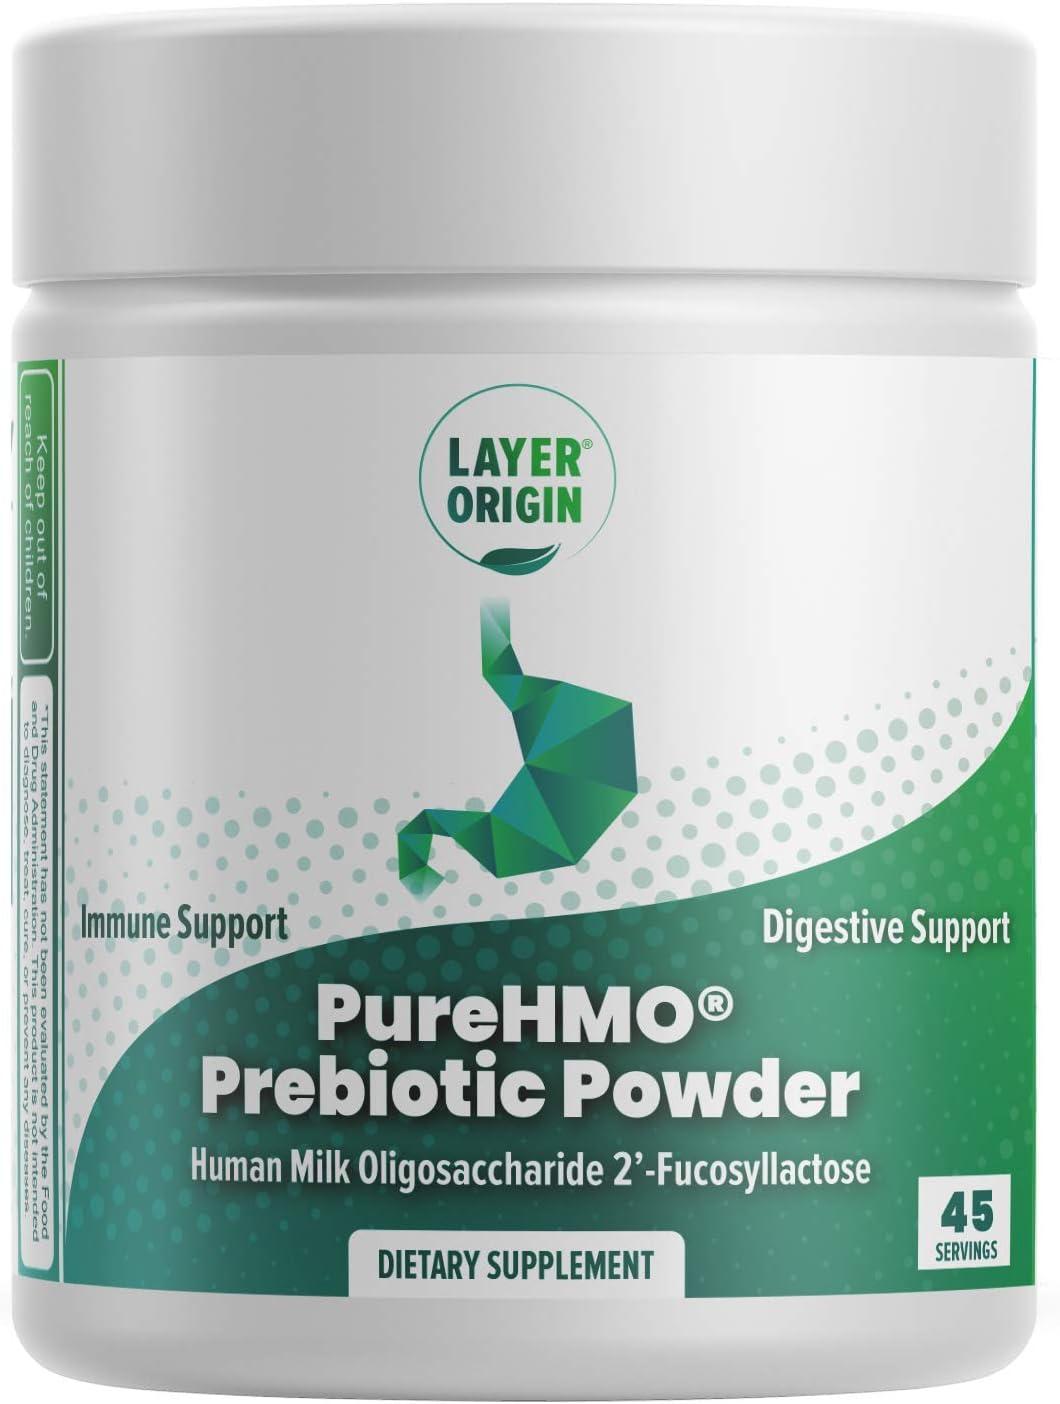 Layer Origin - PureHMO Human Milk Oligosaccharide Powder, Bioidentical 2'-Fucosyllactose, 1950 mg, 45 Servings